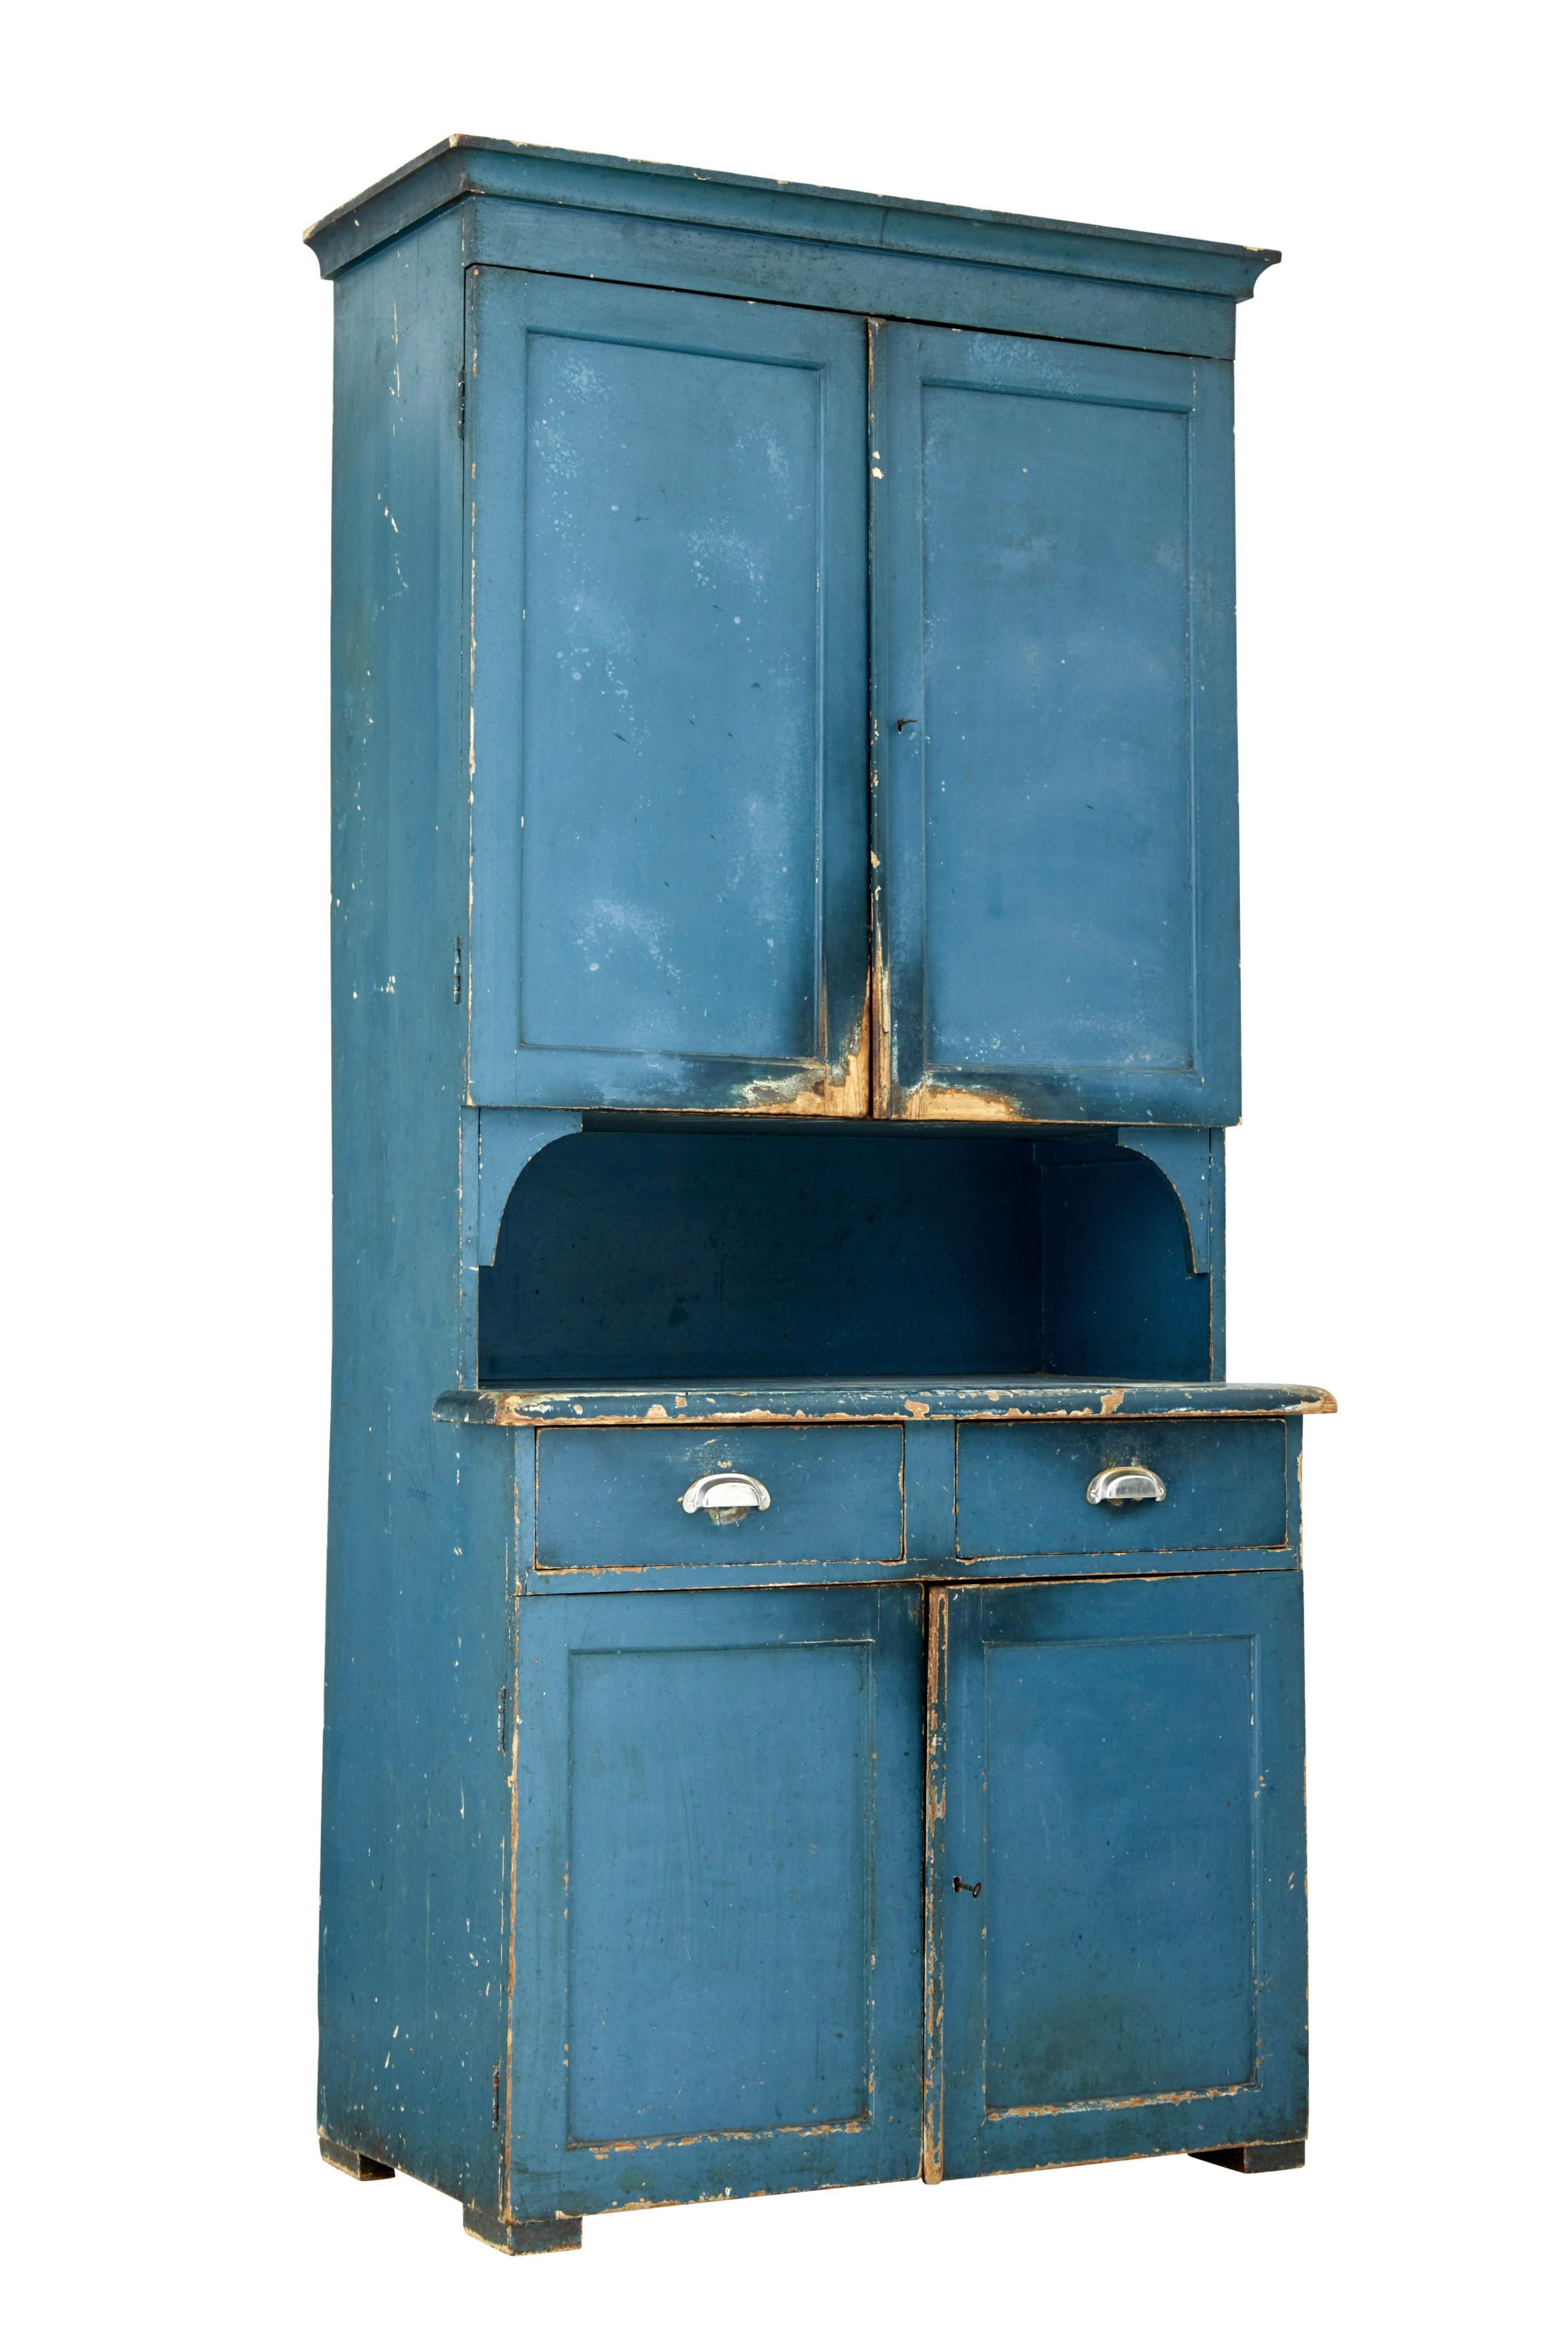 19th century swedish painted pine kitchen cupboard